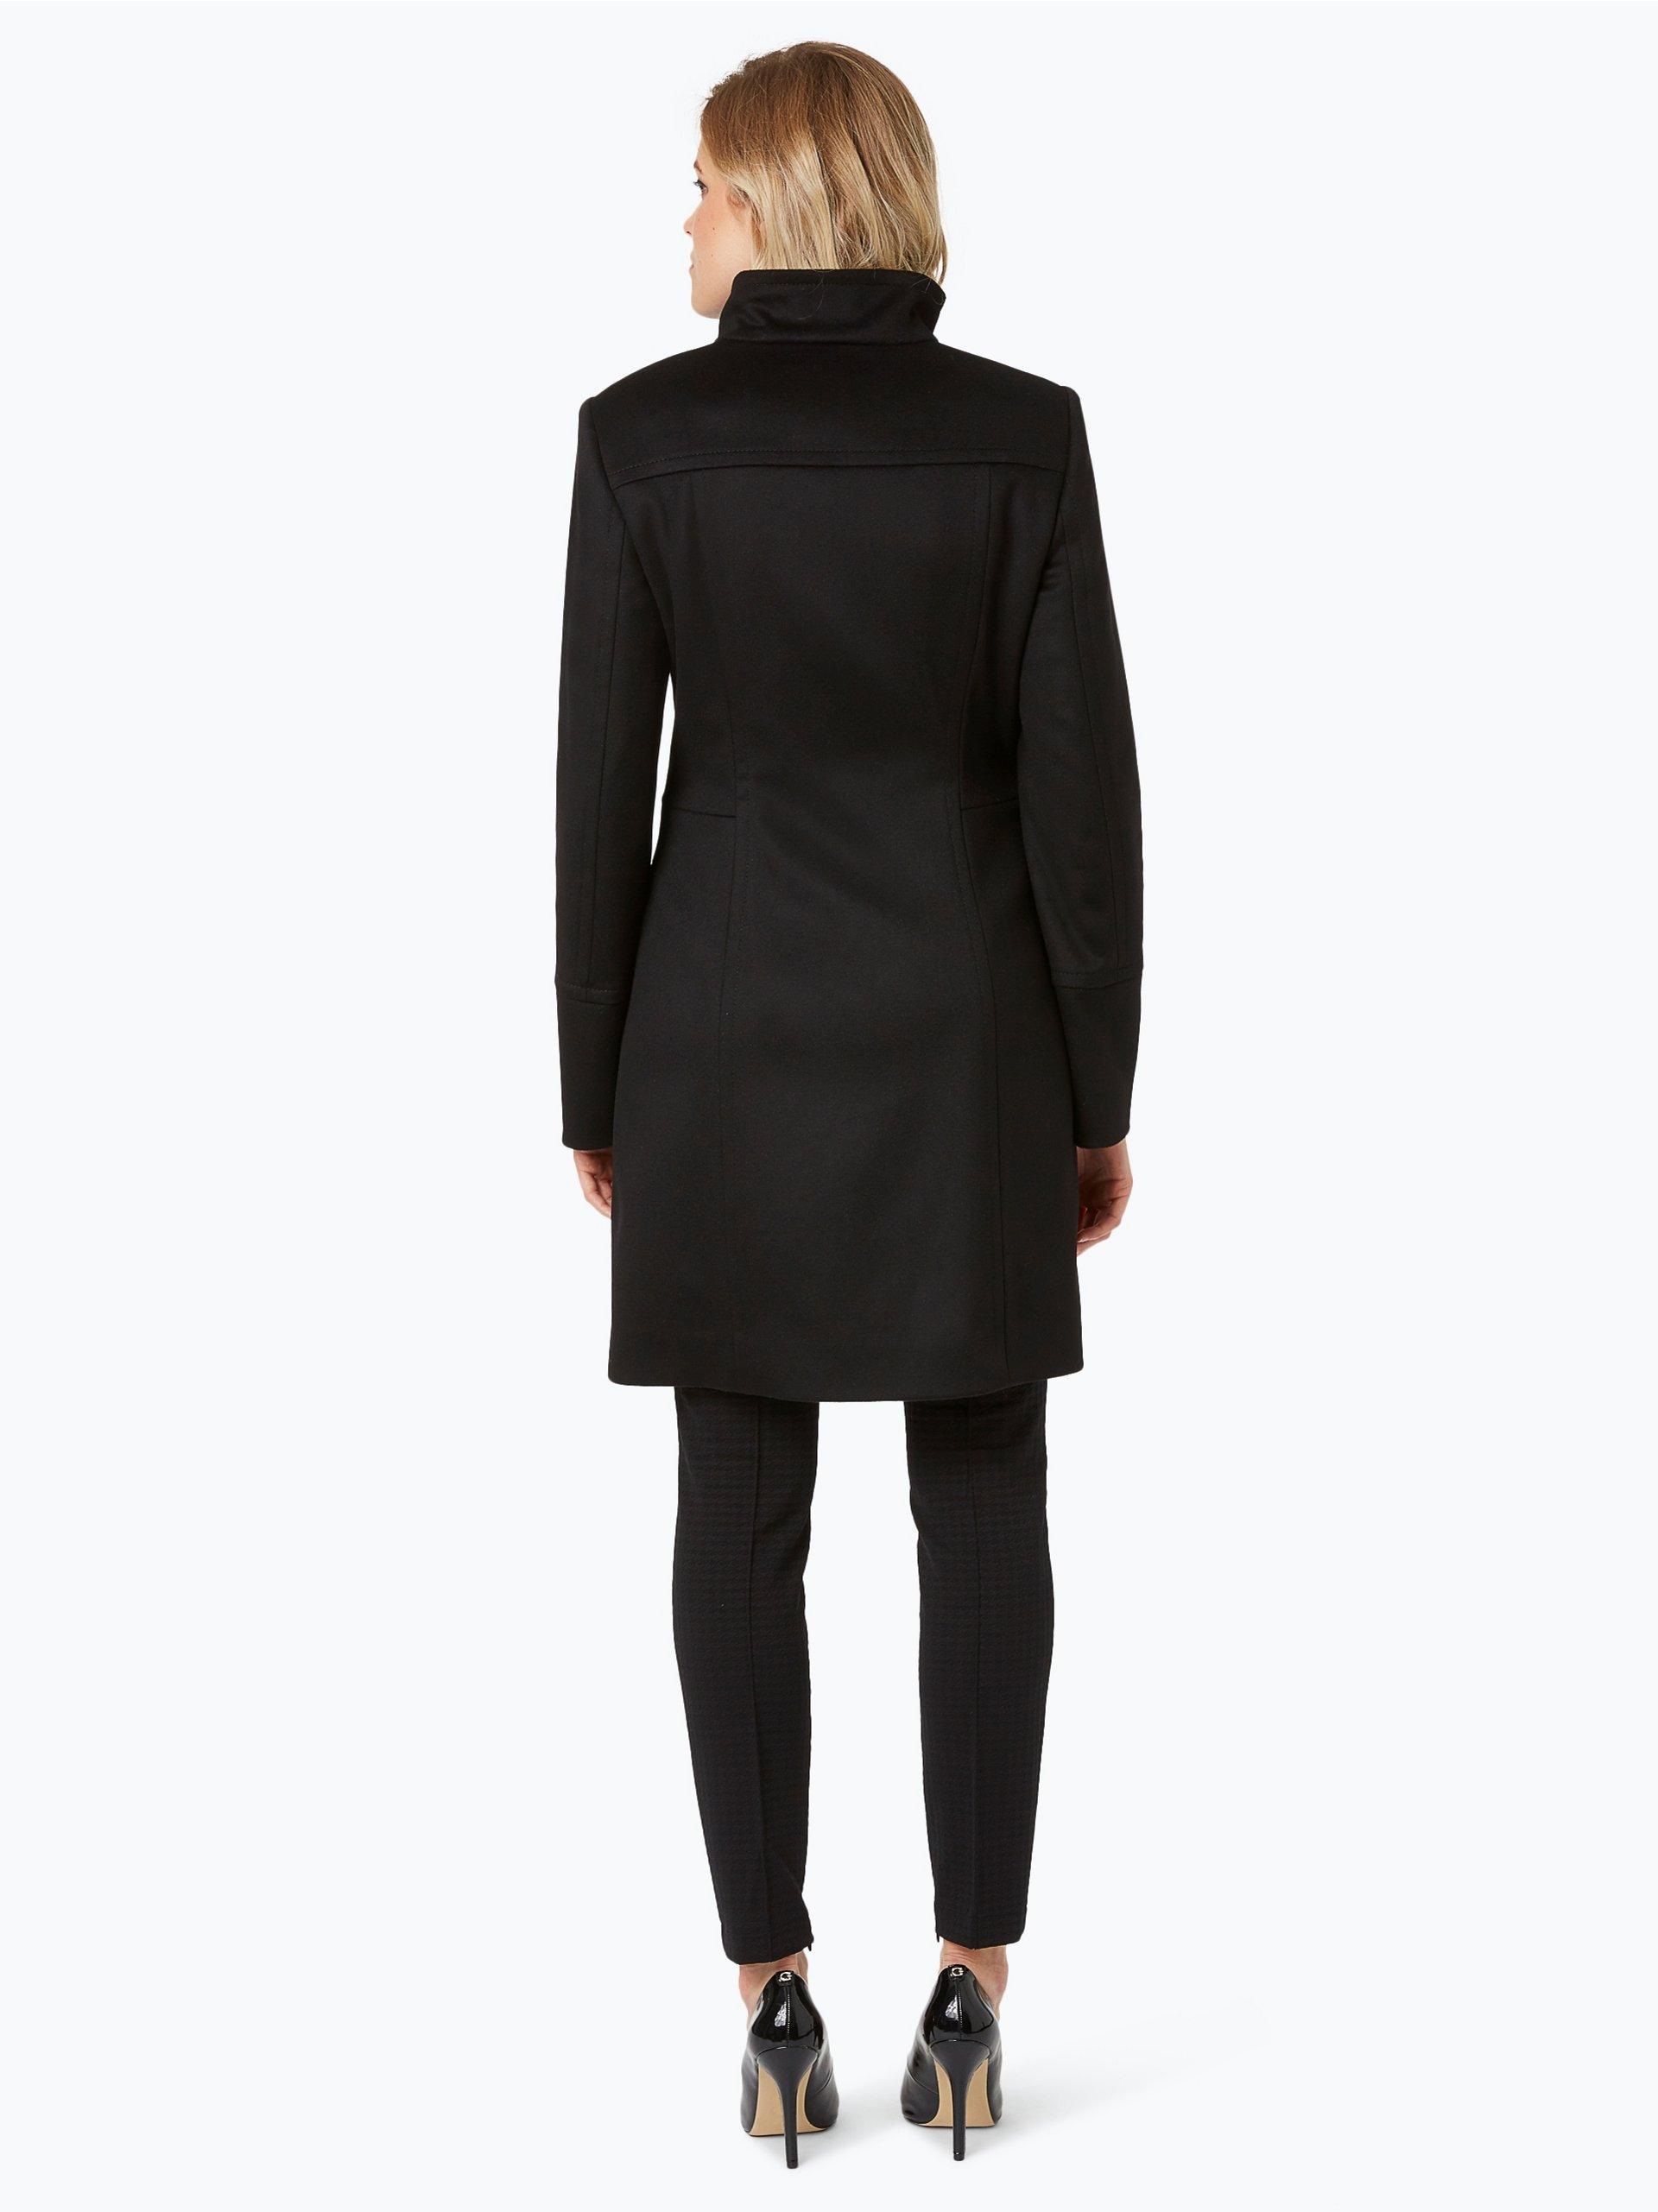 boss damen mantel mit cashmere anteil cosamyna schwarz uni online kaufen vangraaf com. Black Bedroom Furniture Sets. Home Design Ideas